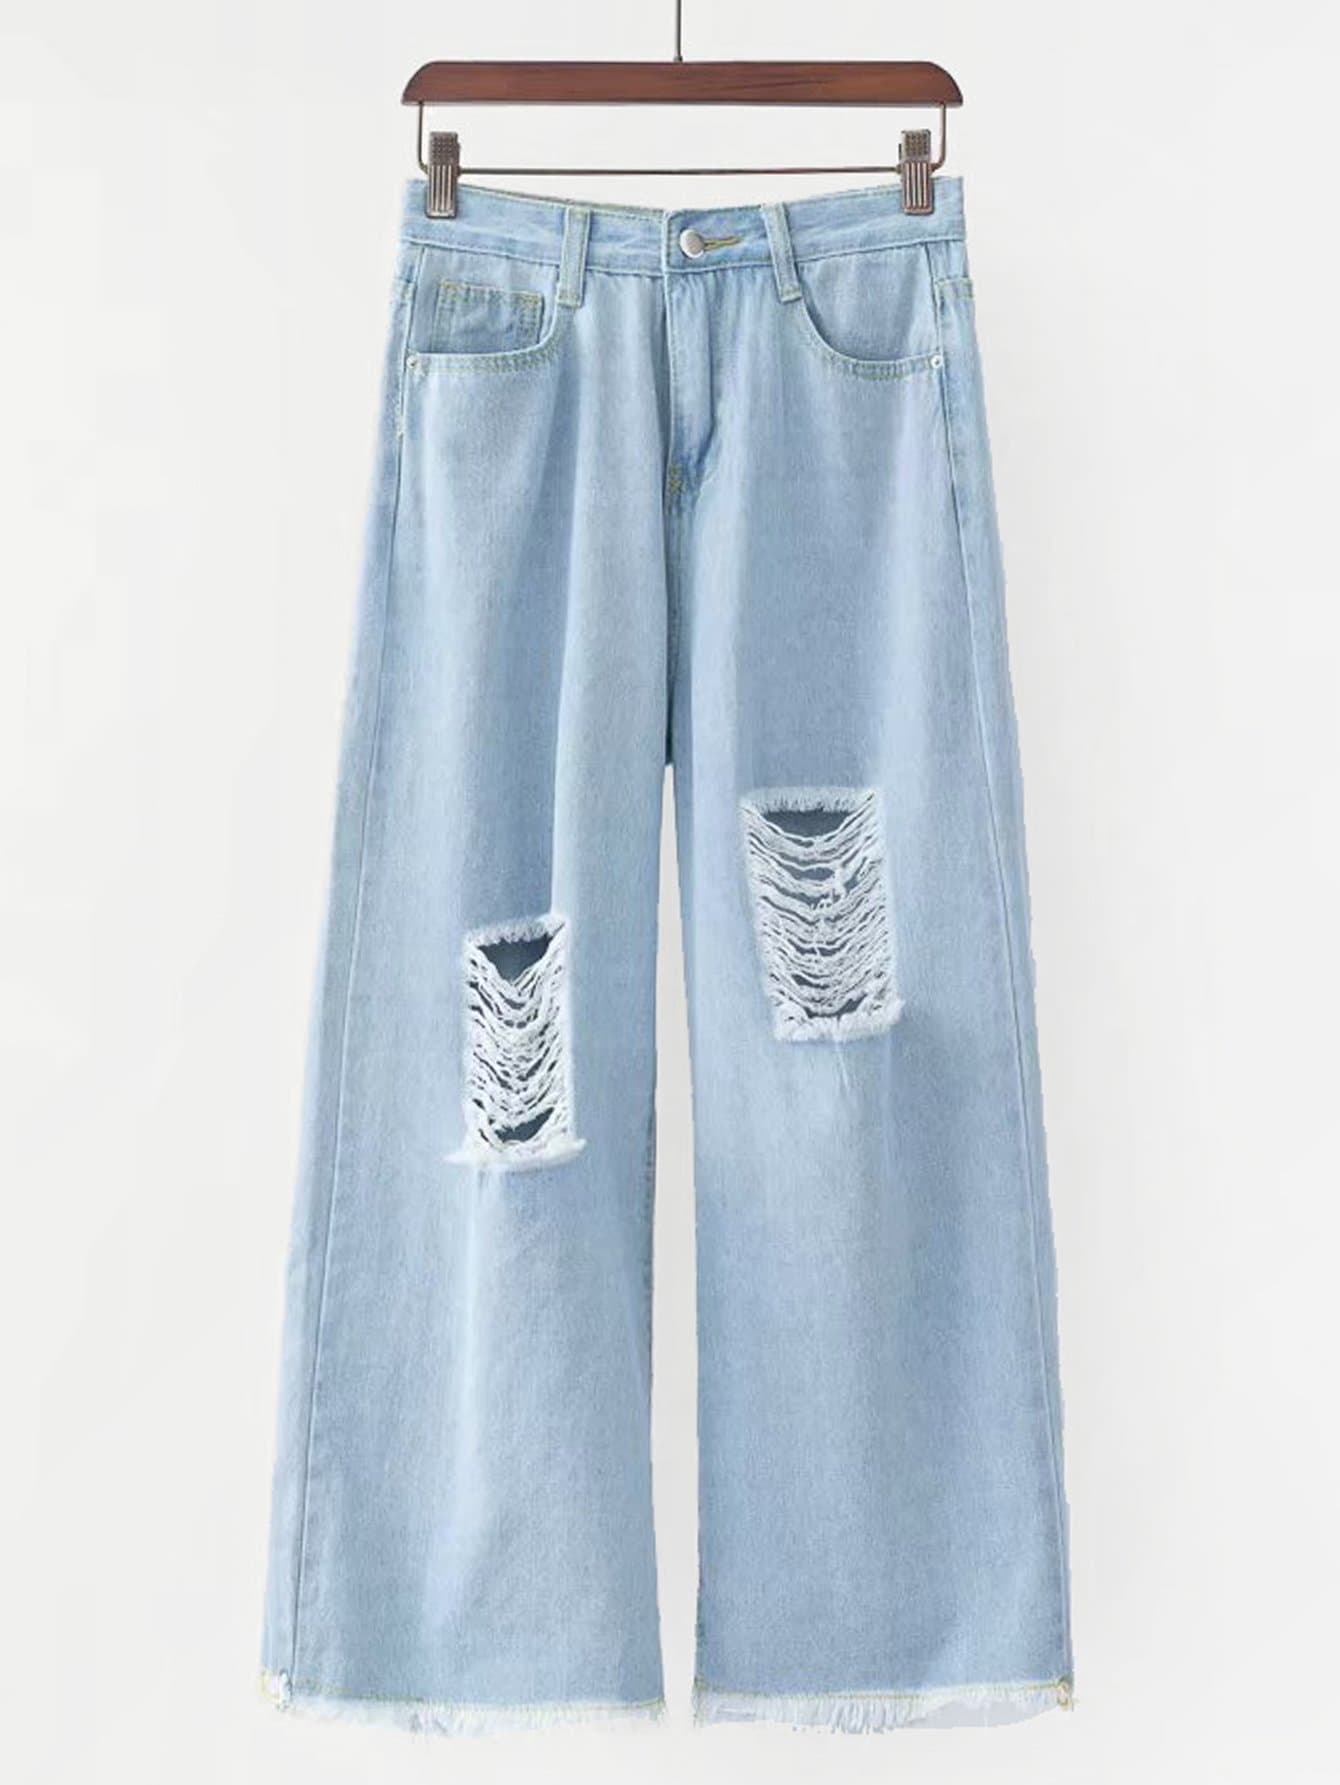 Ripped Raw Hem Wide Leg Jeans wide striped ripped dress